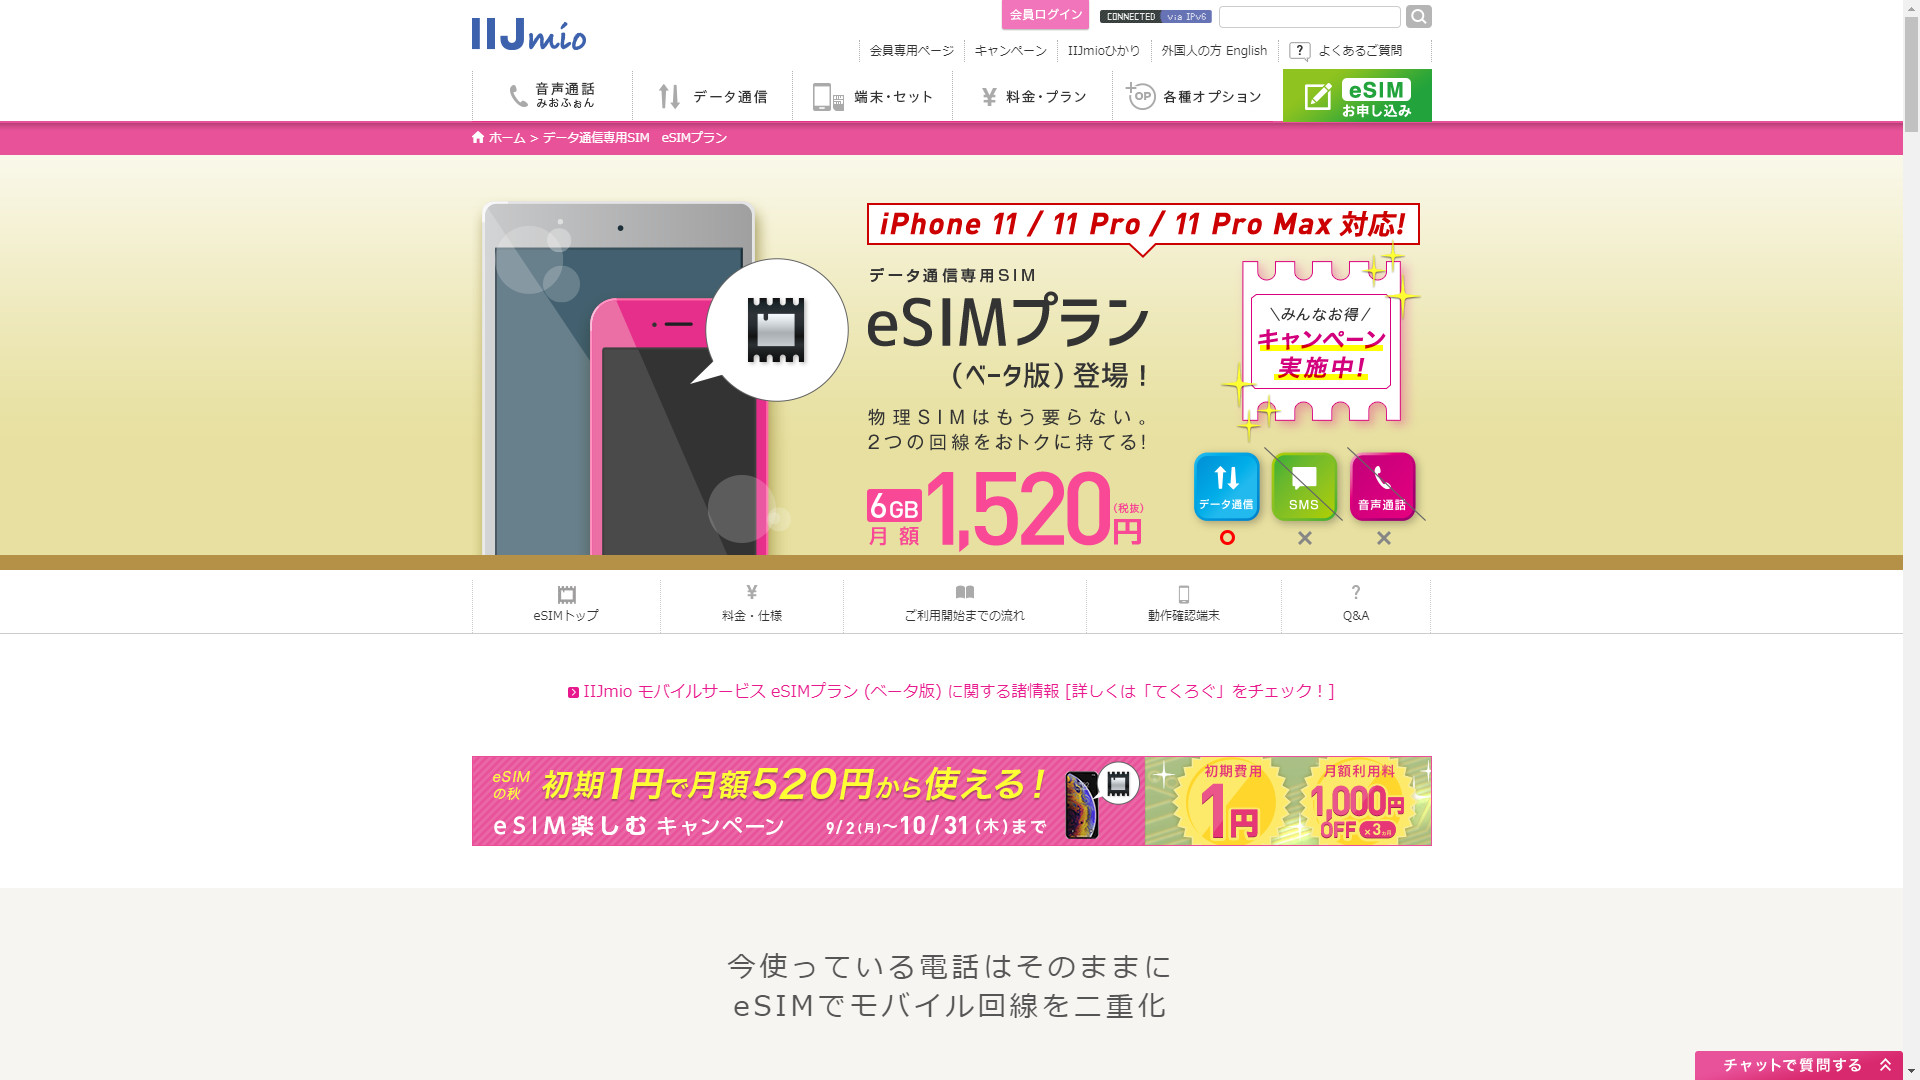 IIJmioのeSIMプラン オンライン手続き 申し込み